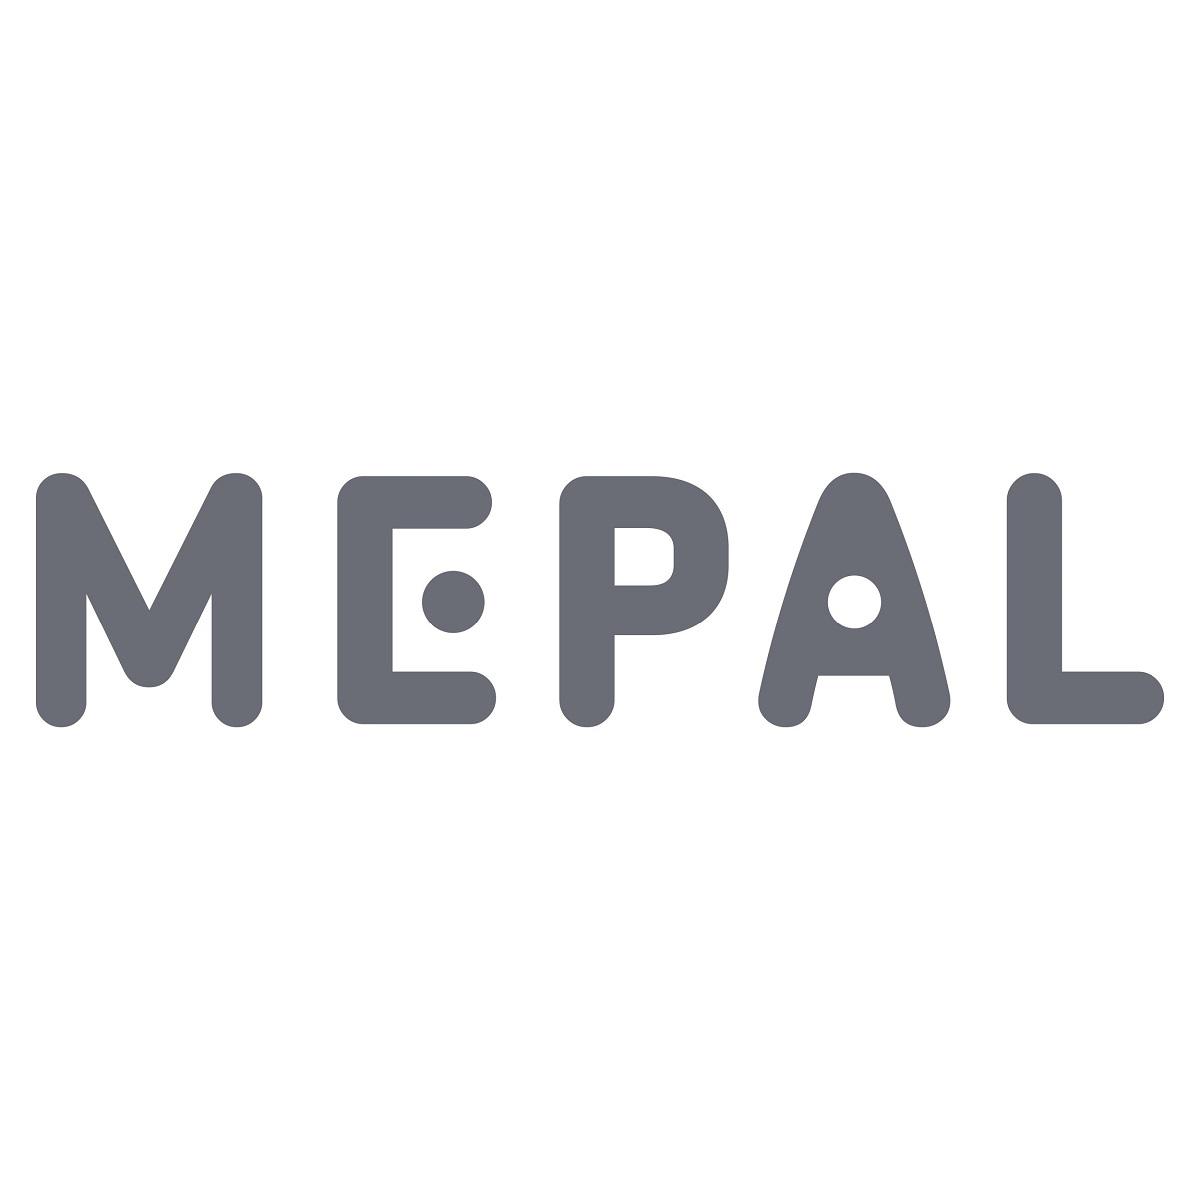 Mepal